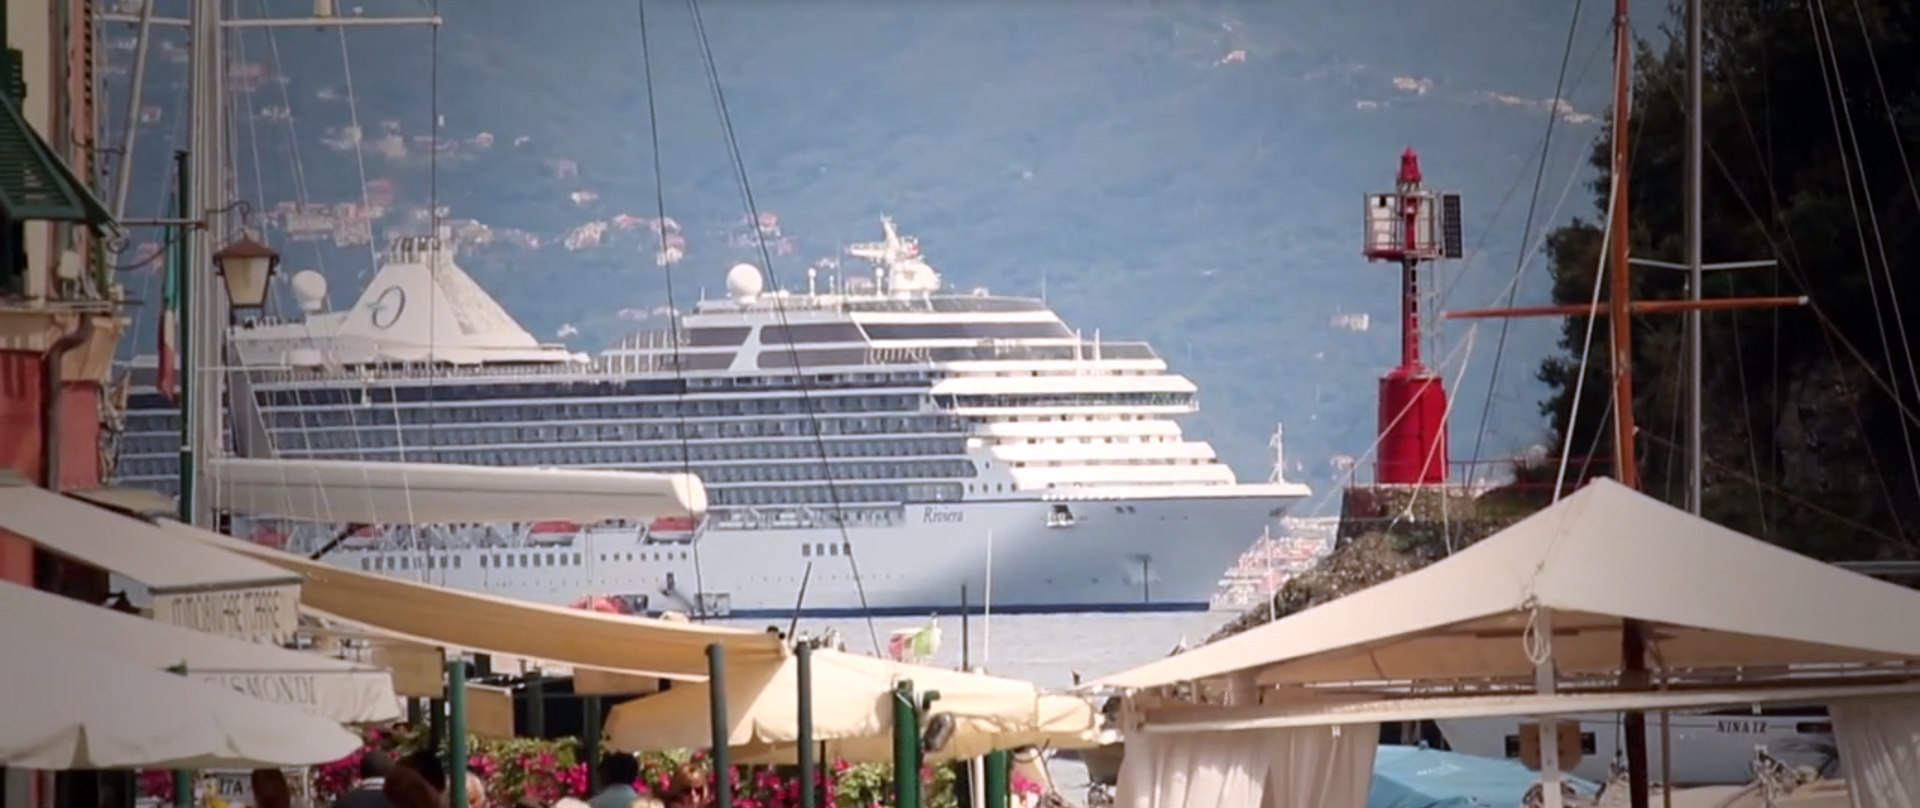 Marina Di Portofino Cruise Fees - Cruise ship fees